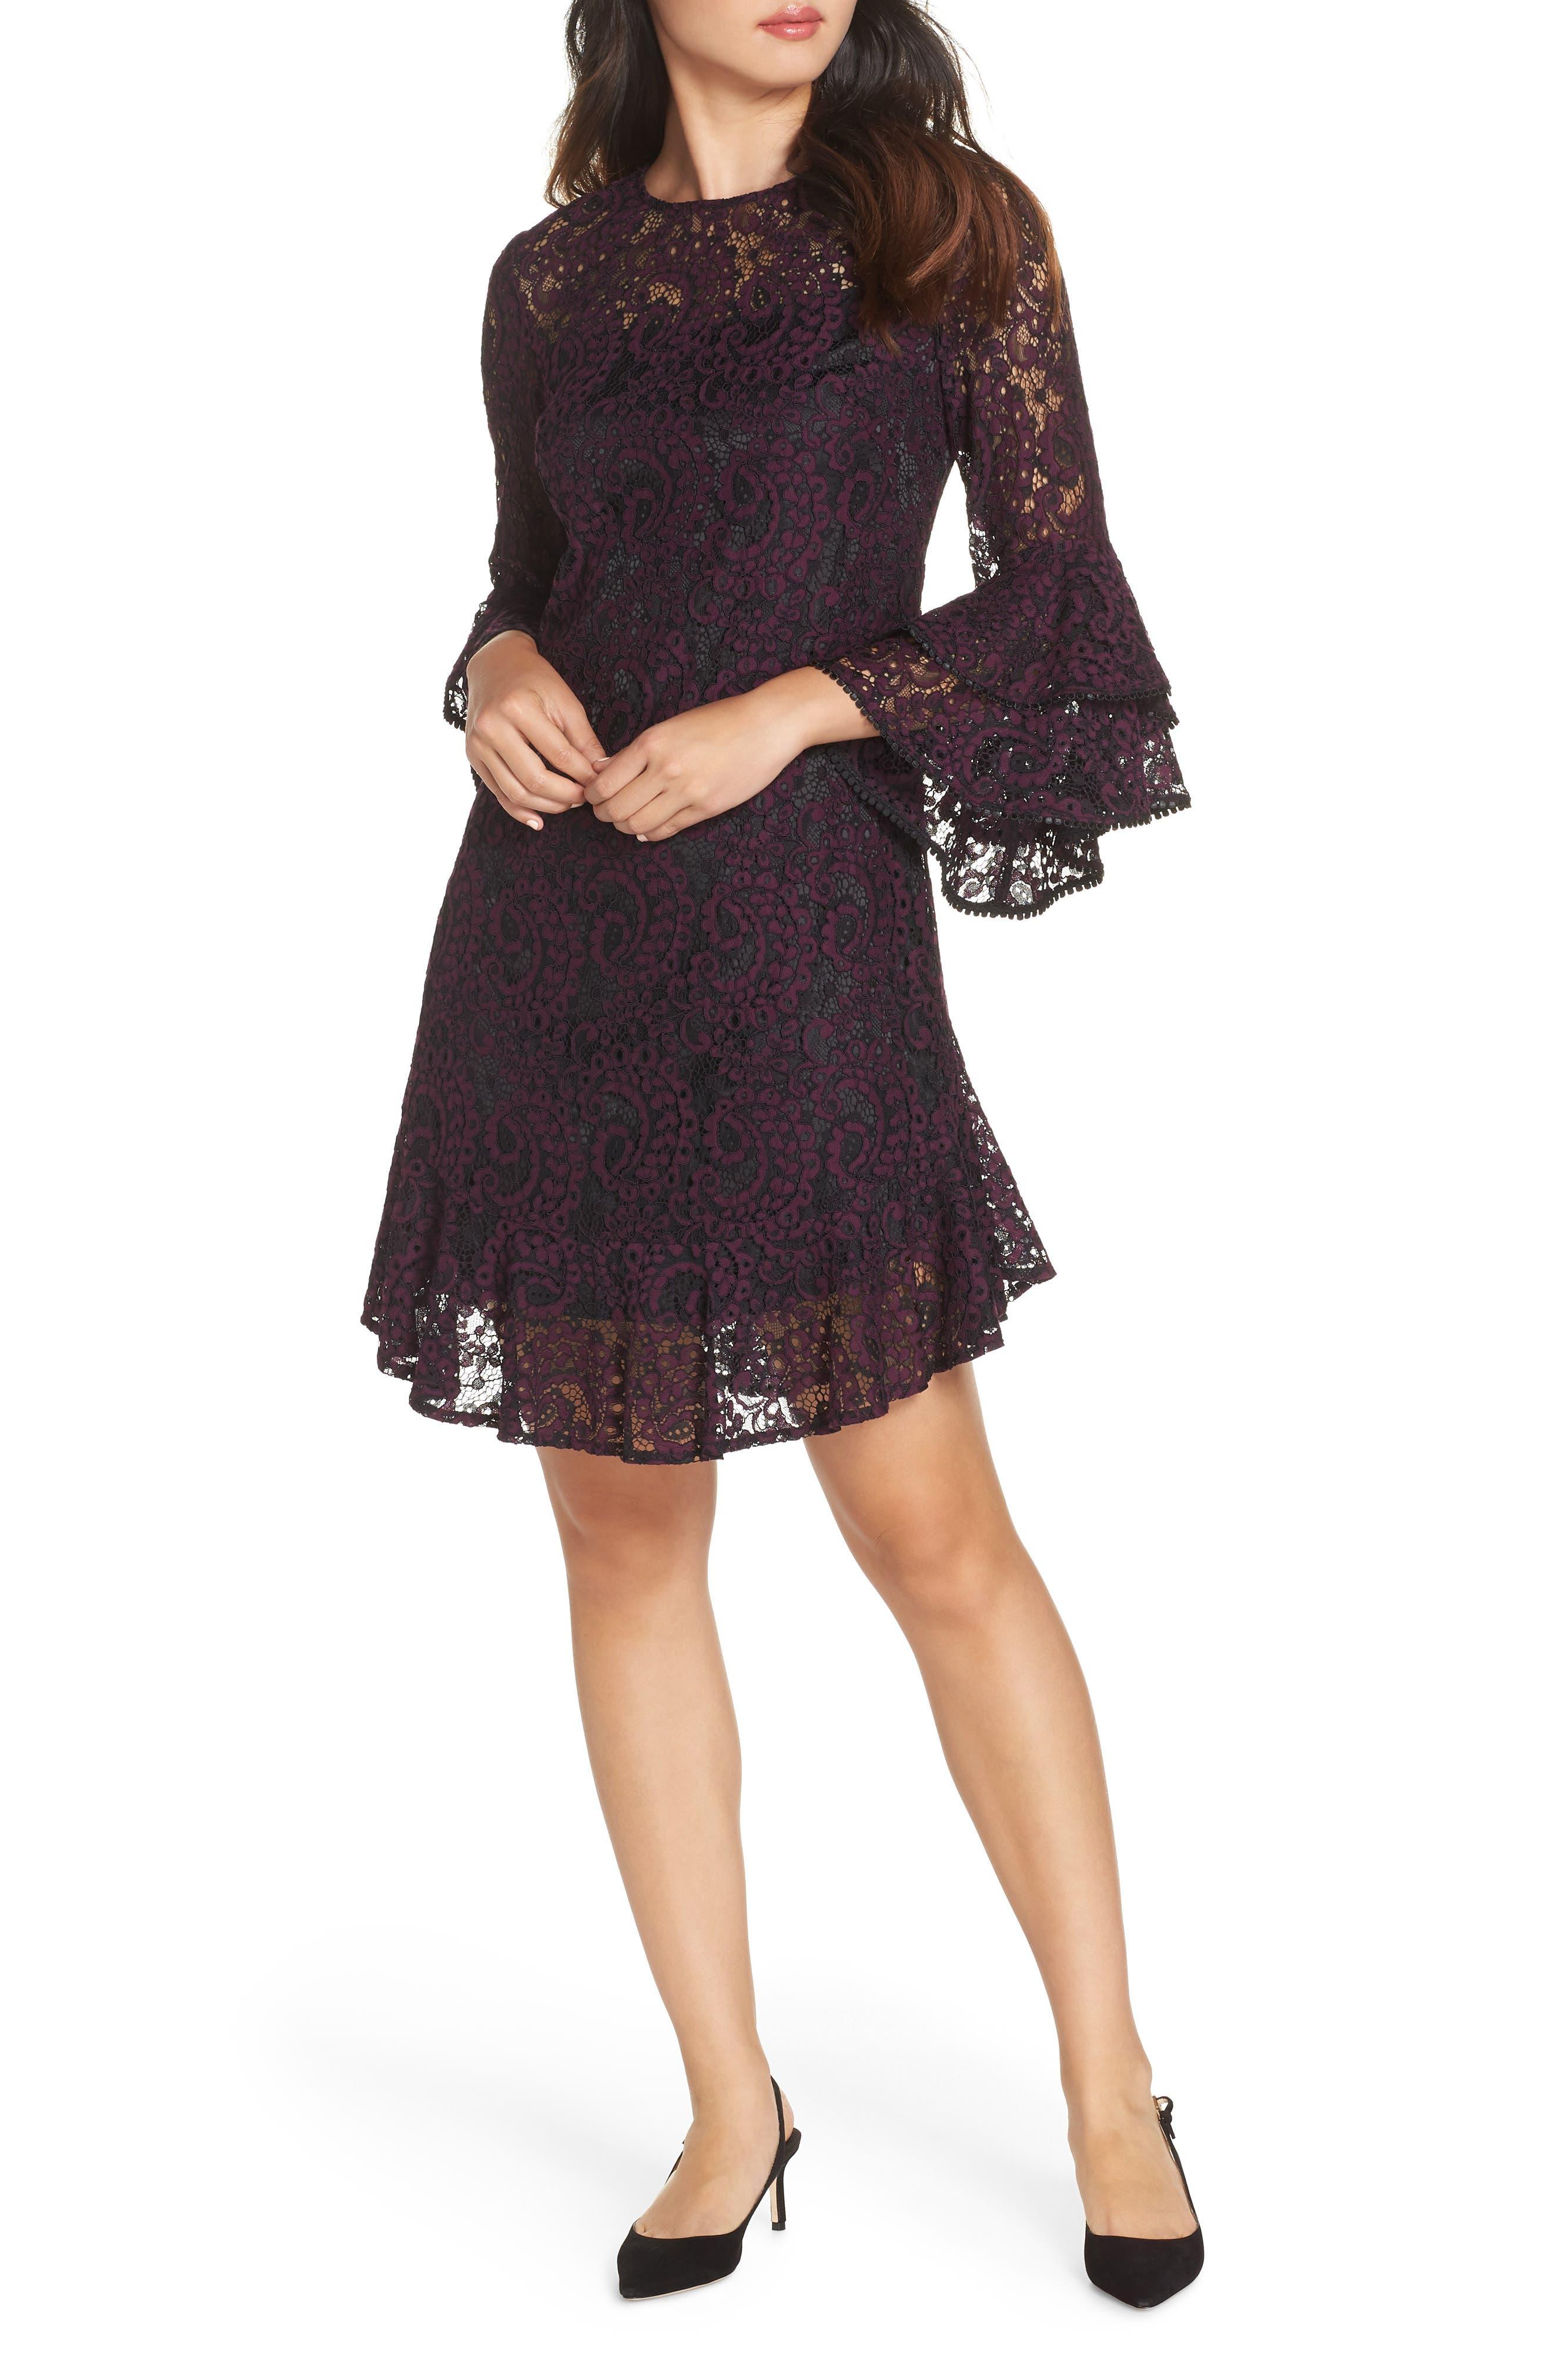 ELIZA J Double Ruffle Lace Dress in Eggplant